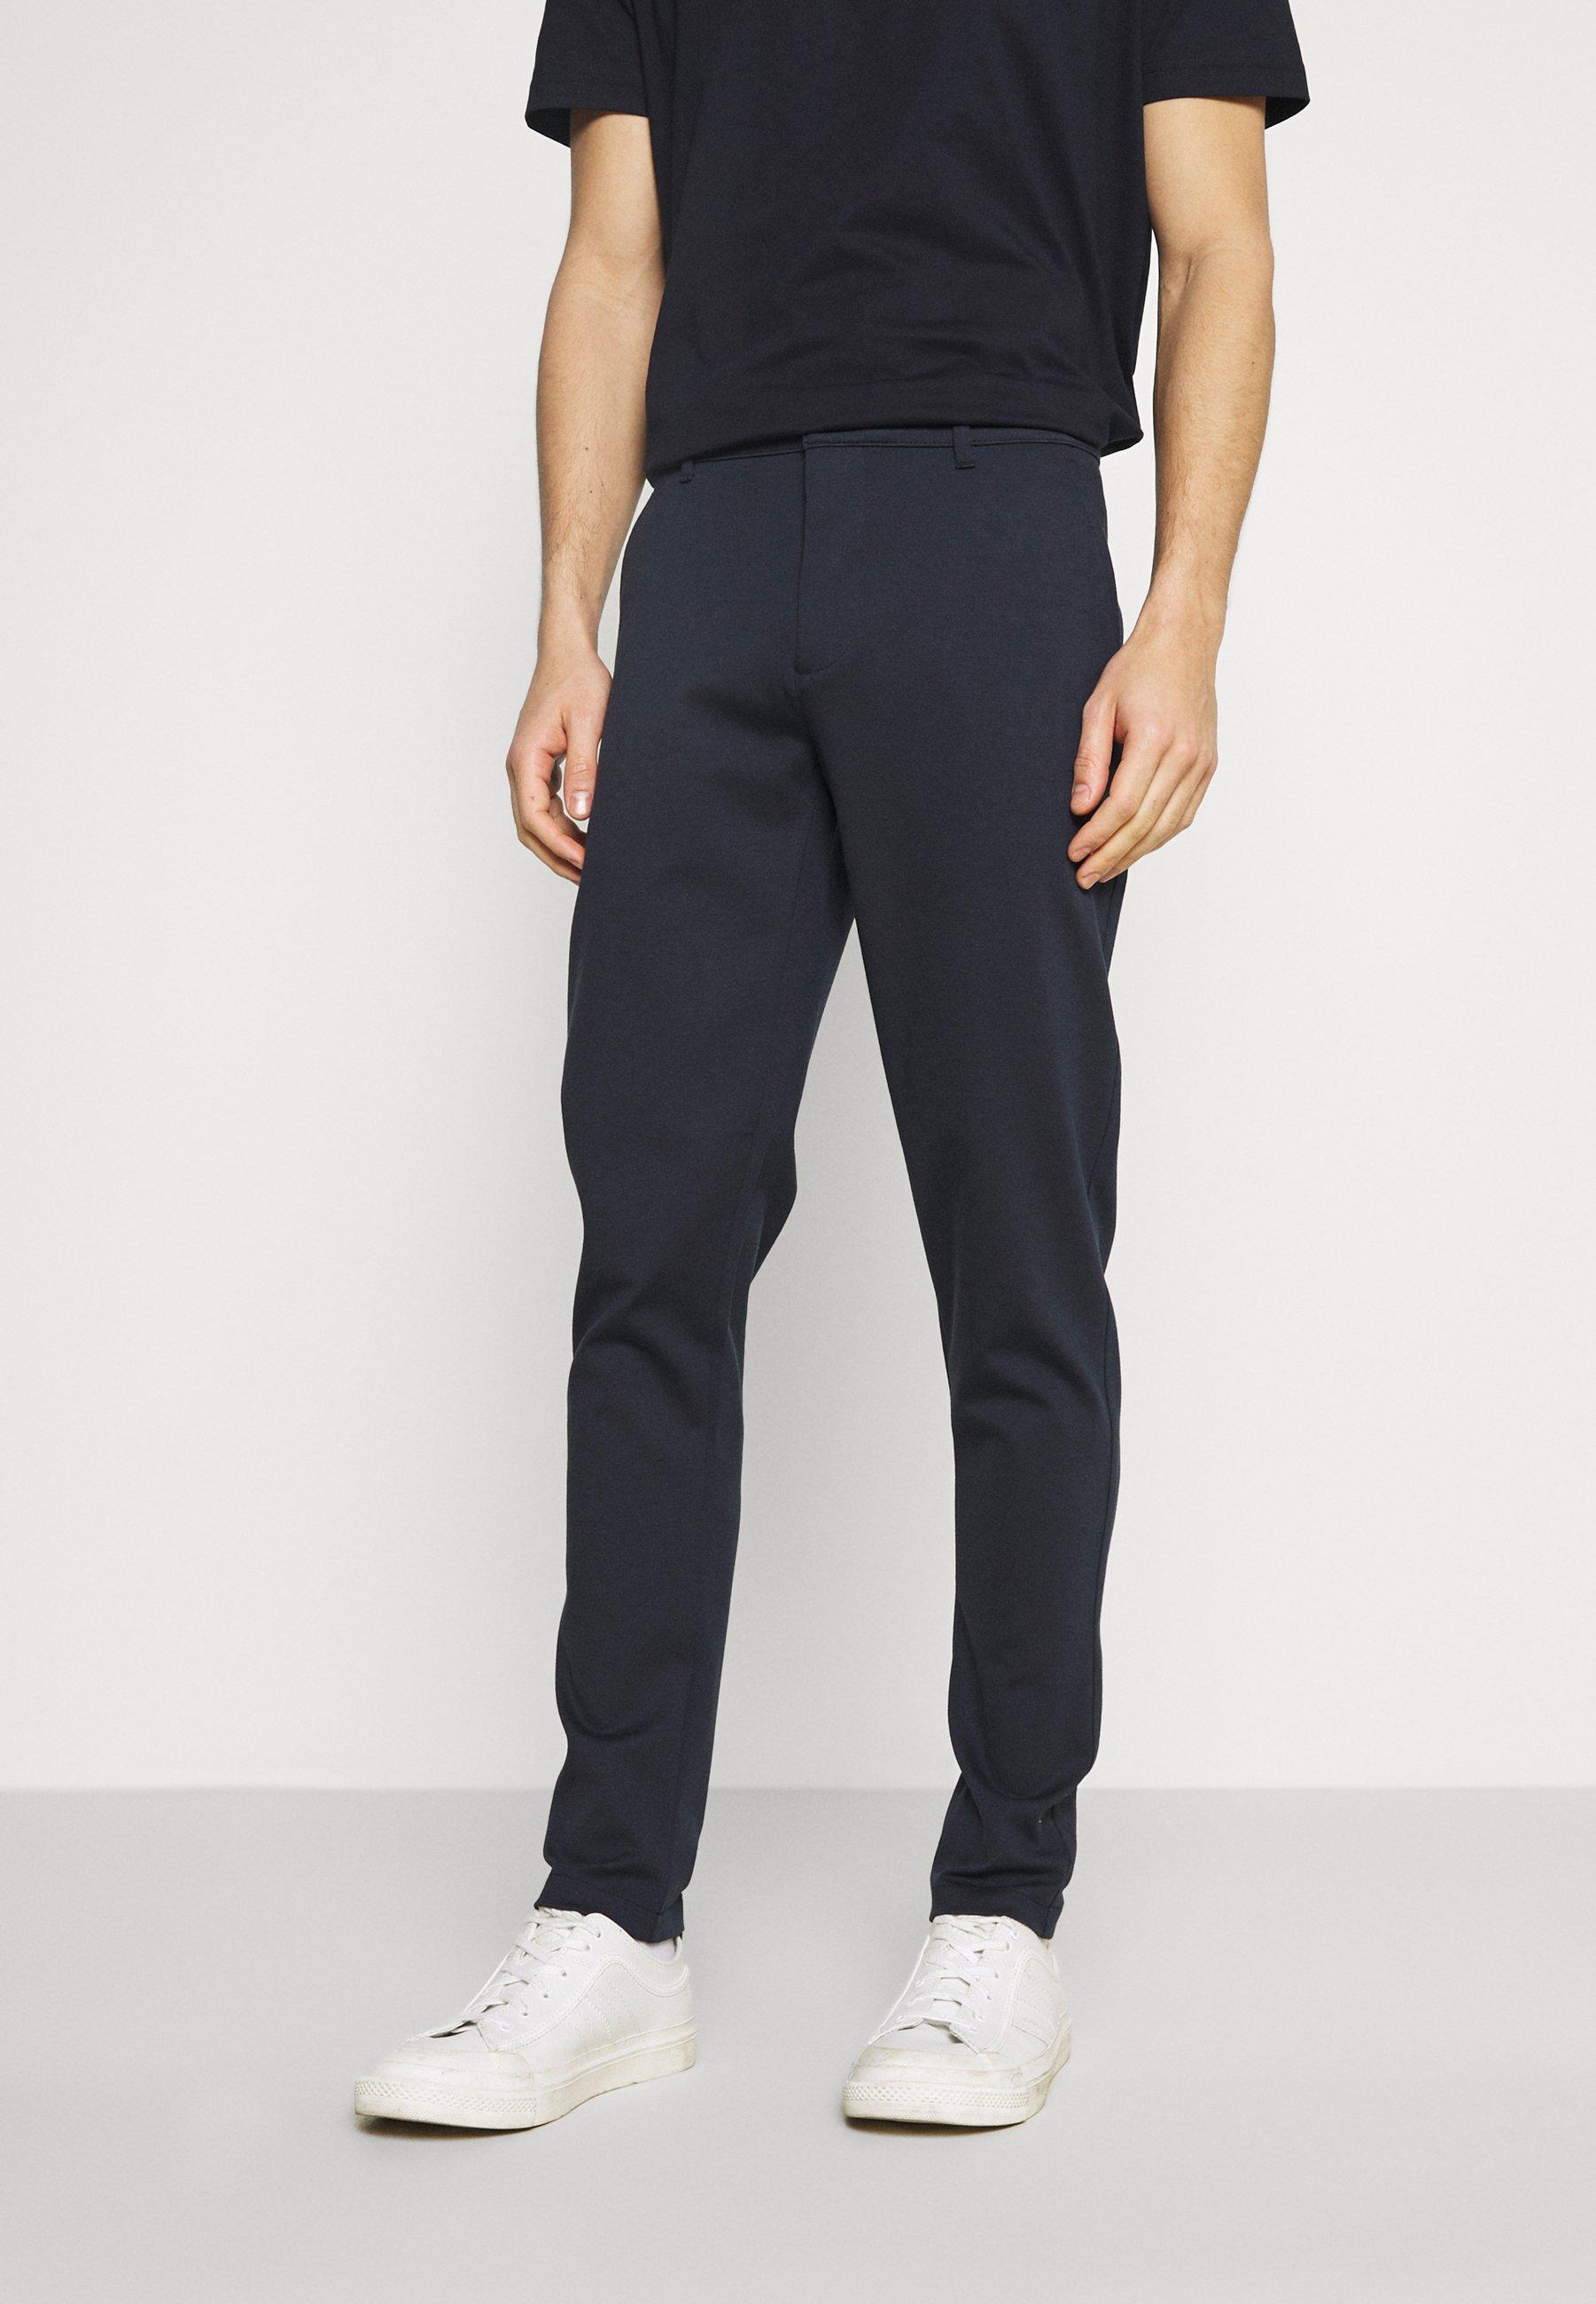 Uomo DAVE BARRO - Pantaloni